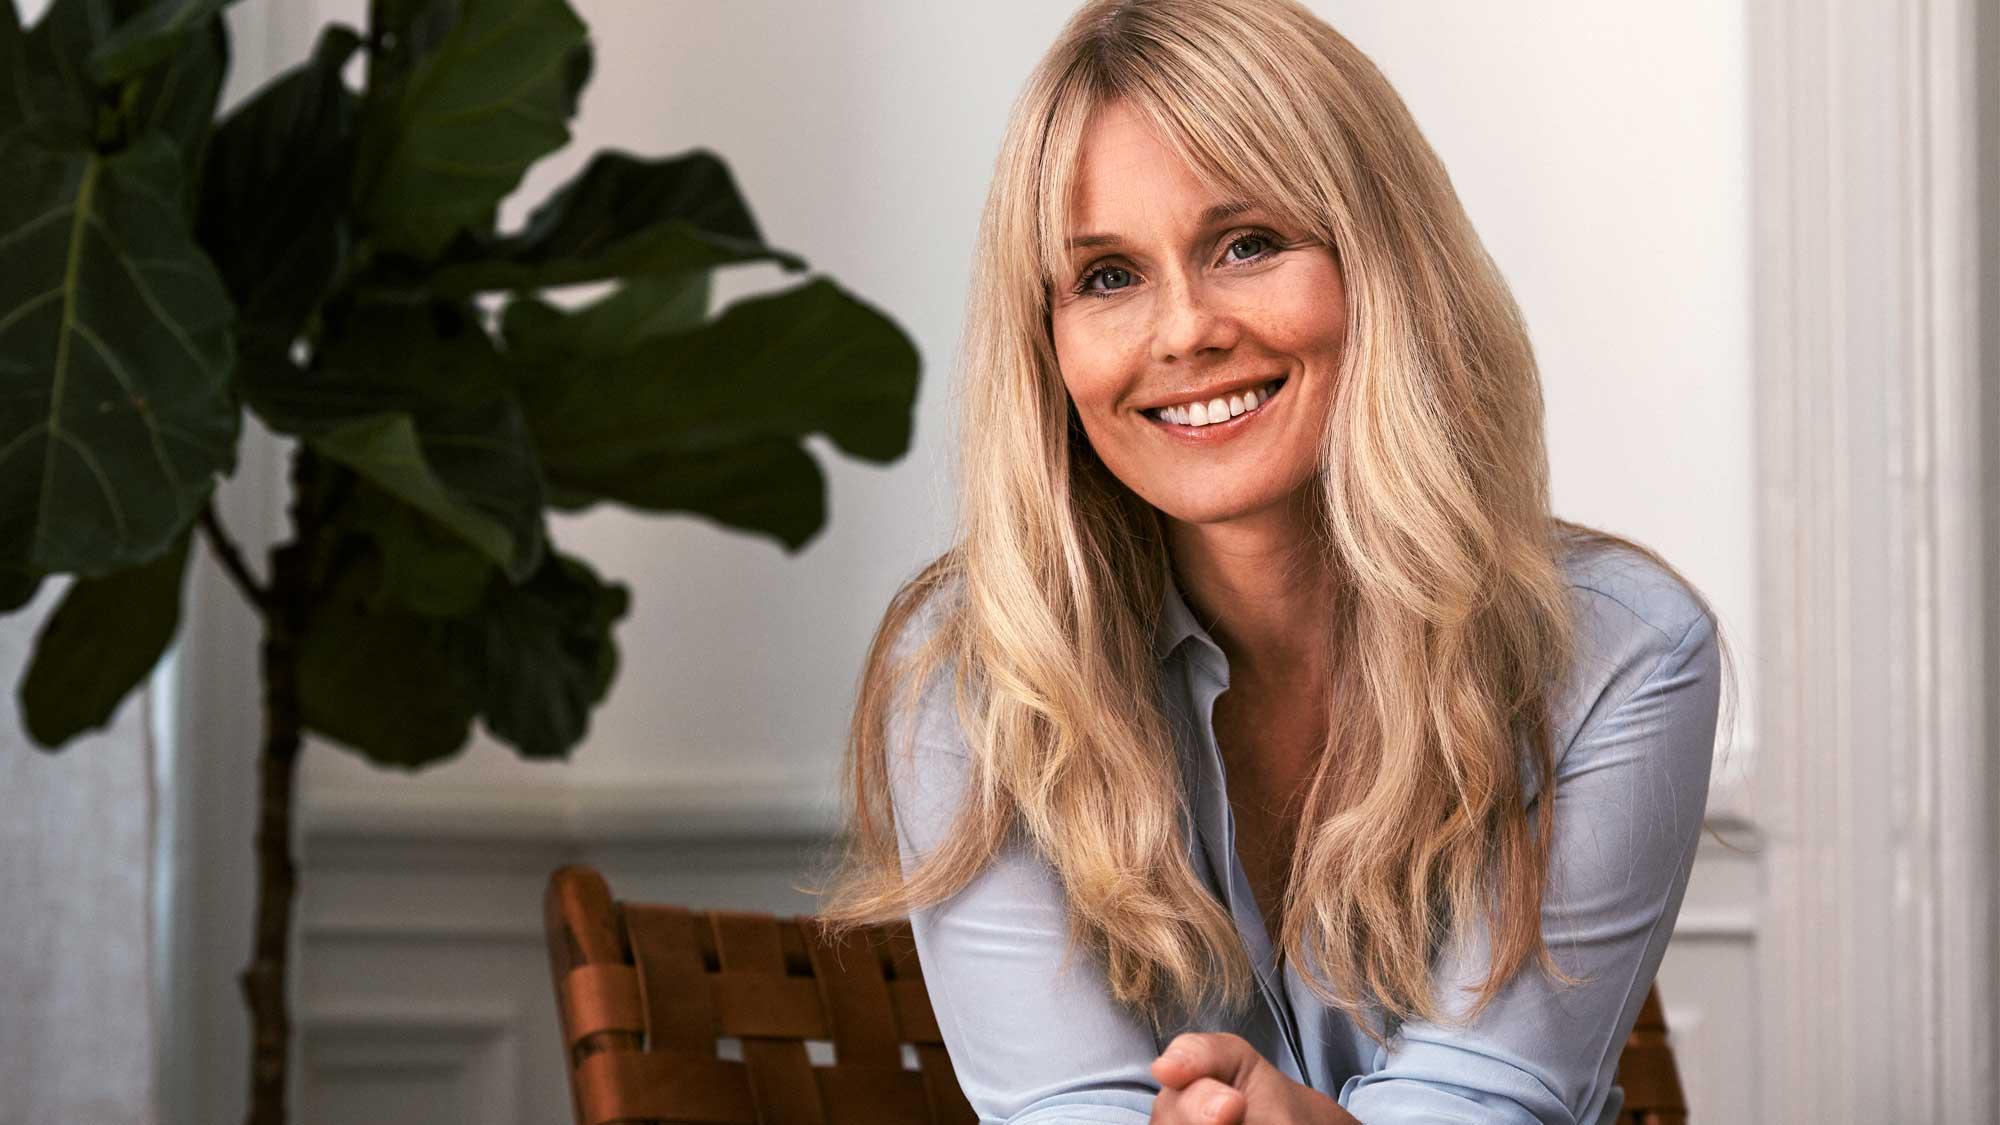 Helenas af Sandebergs mamma gick bort i cancer endast 45 år gammal.